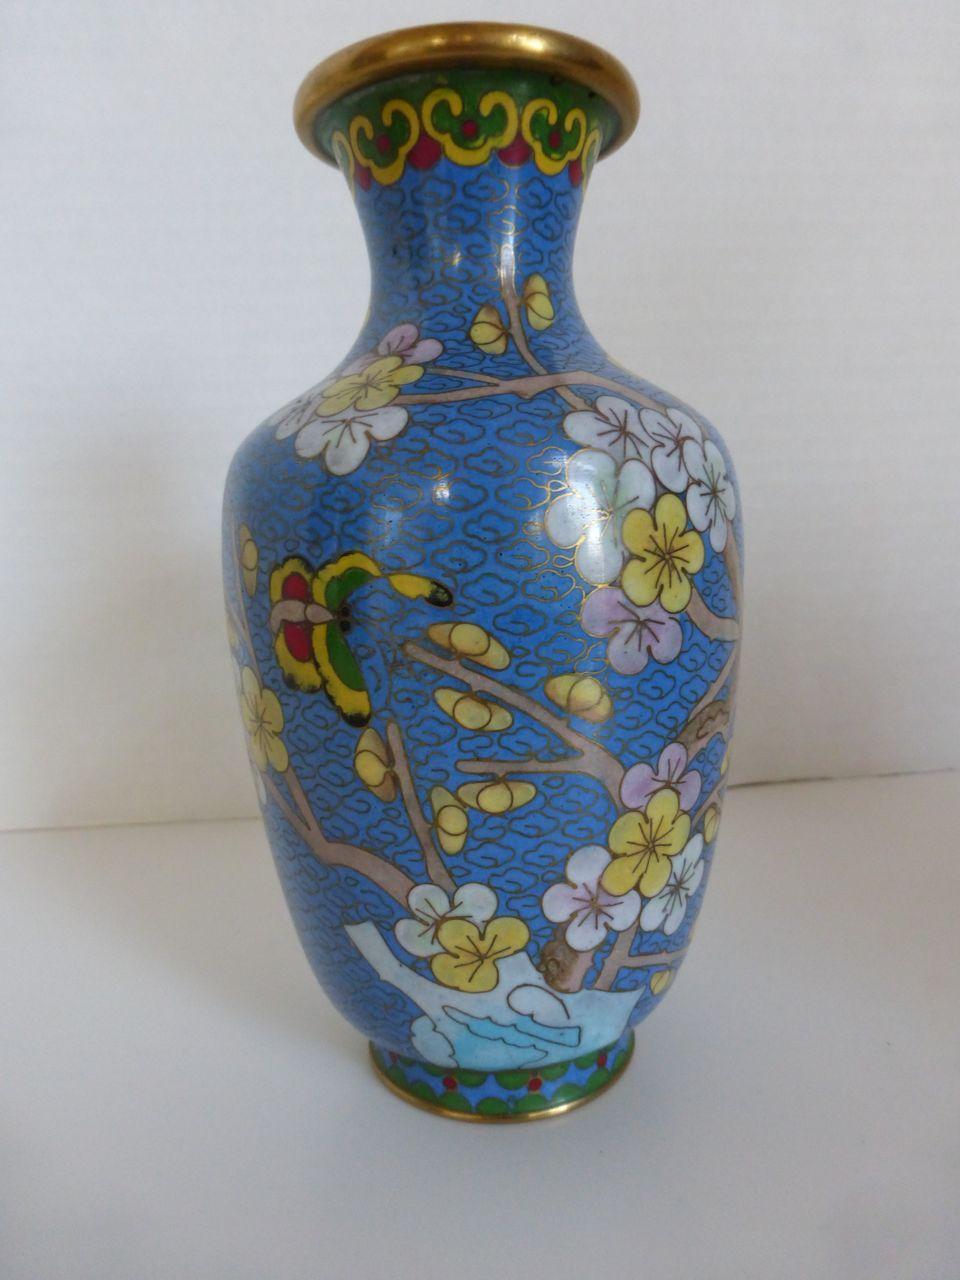 Vintage Cloisonne Cherry Blossom Vase